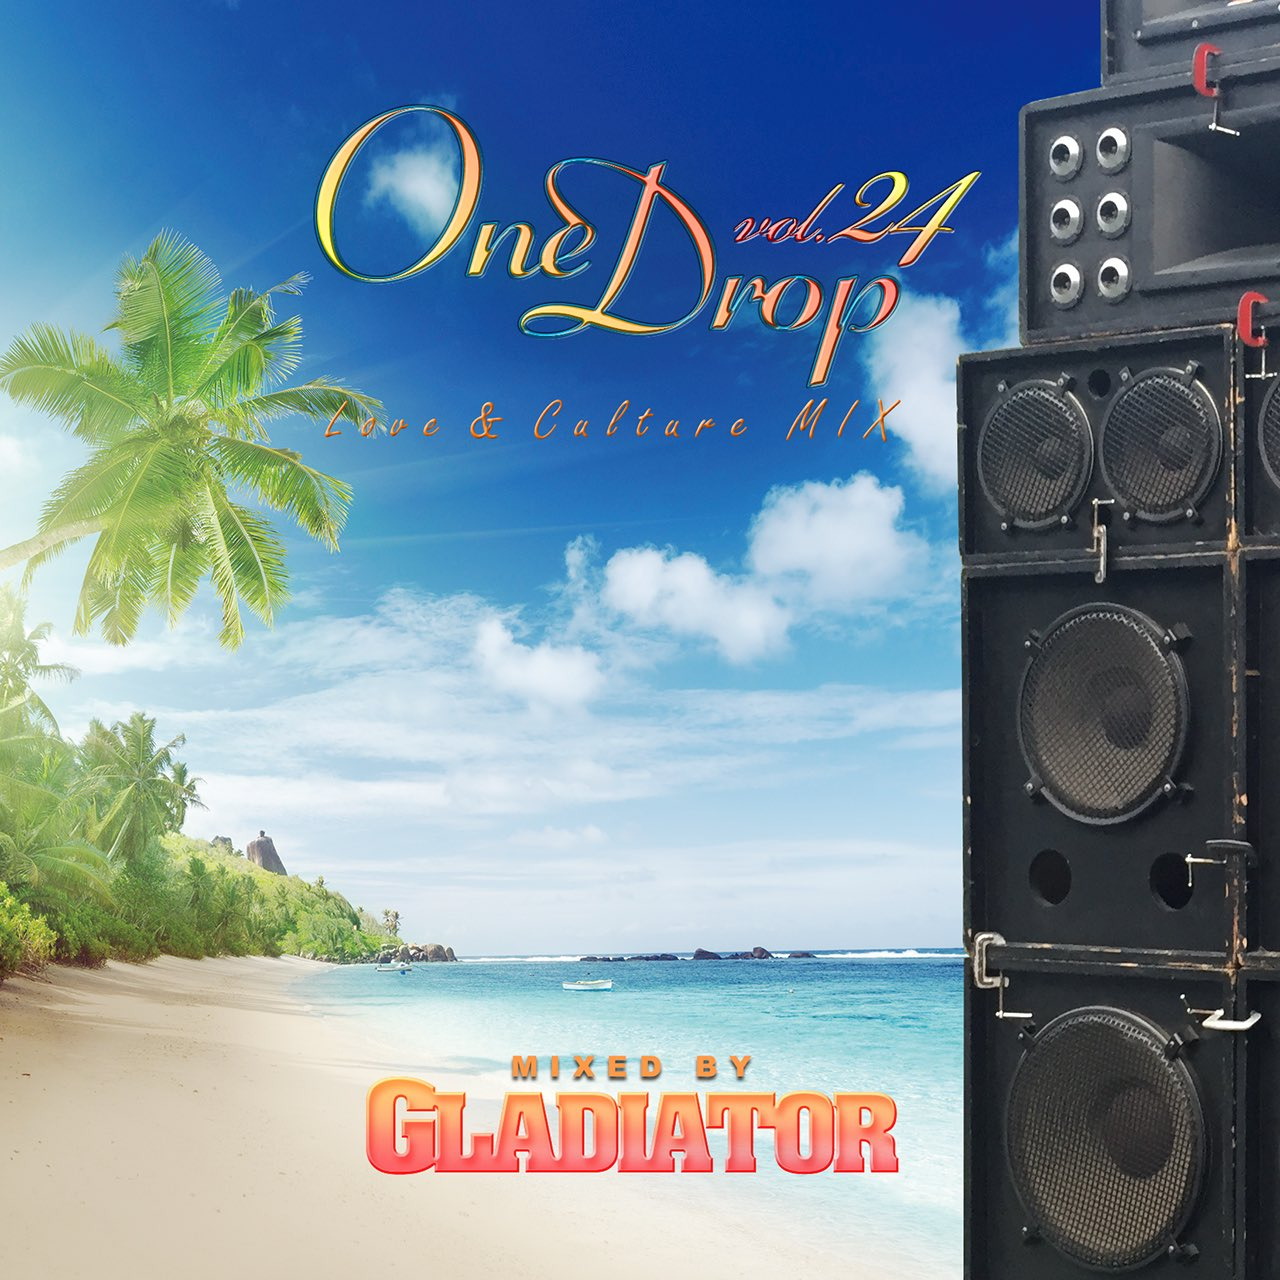 GLADIATOR / One Drop vol.24